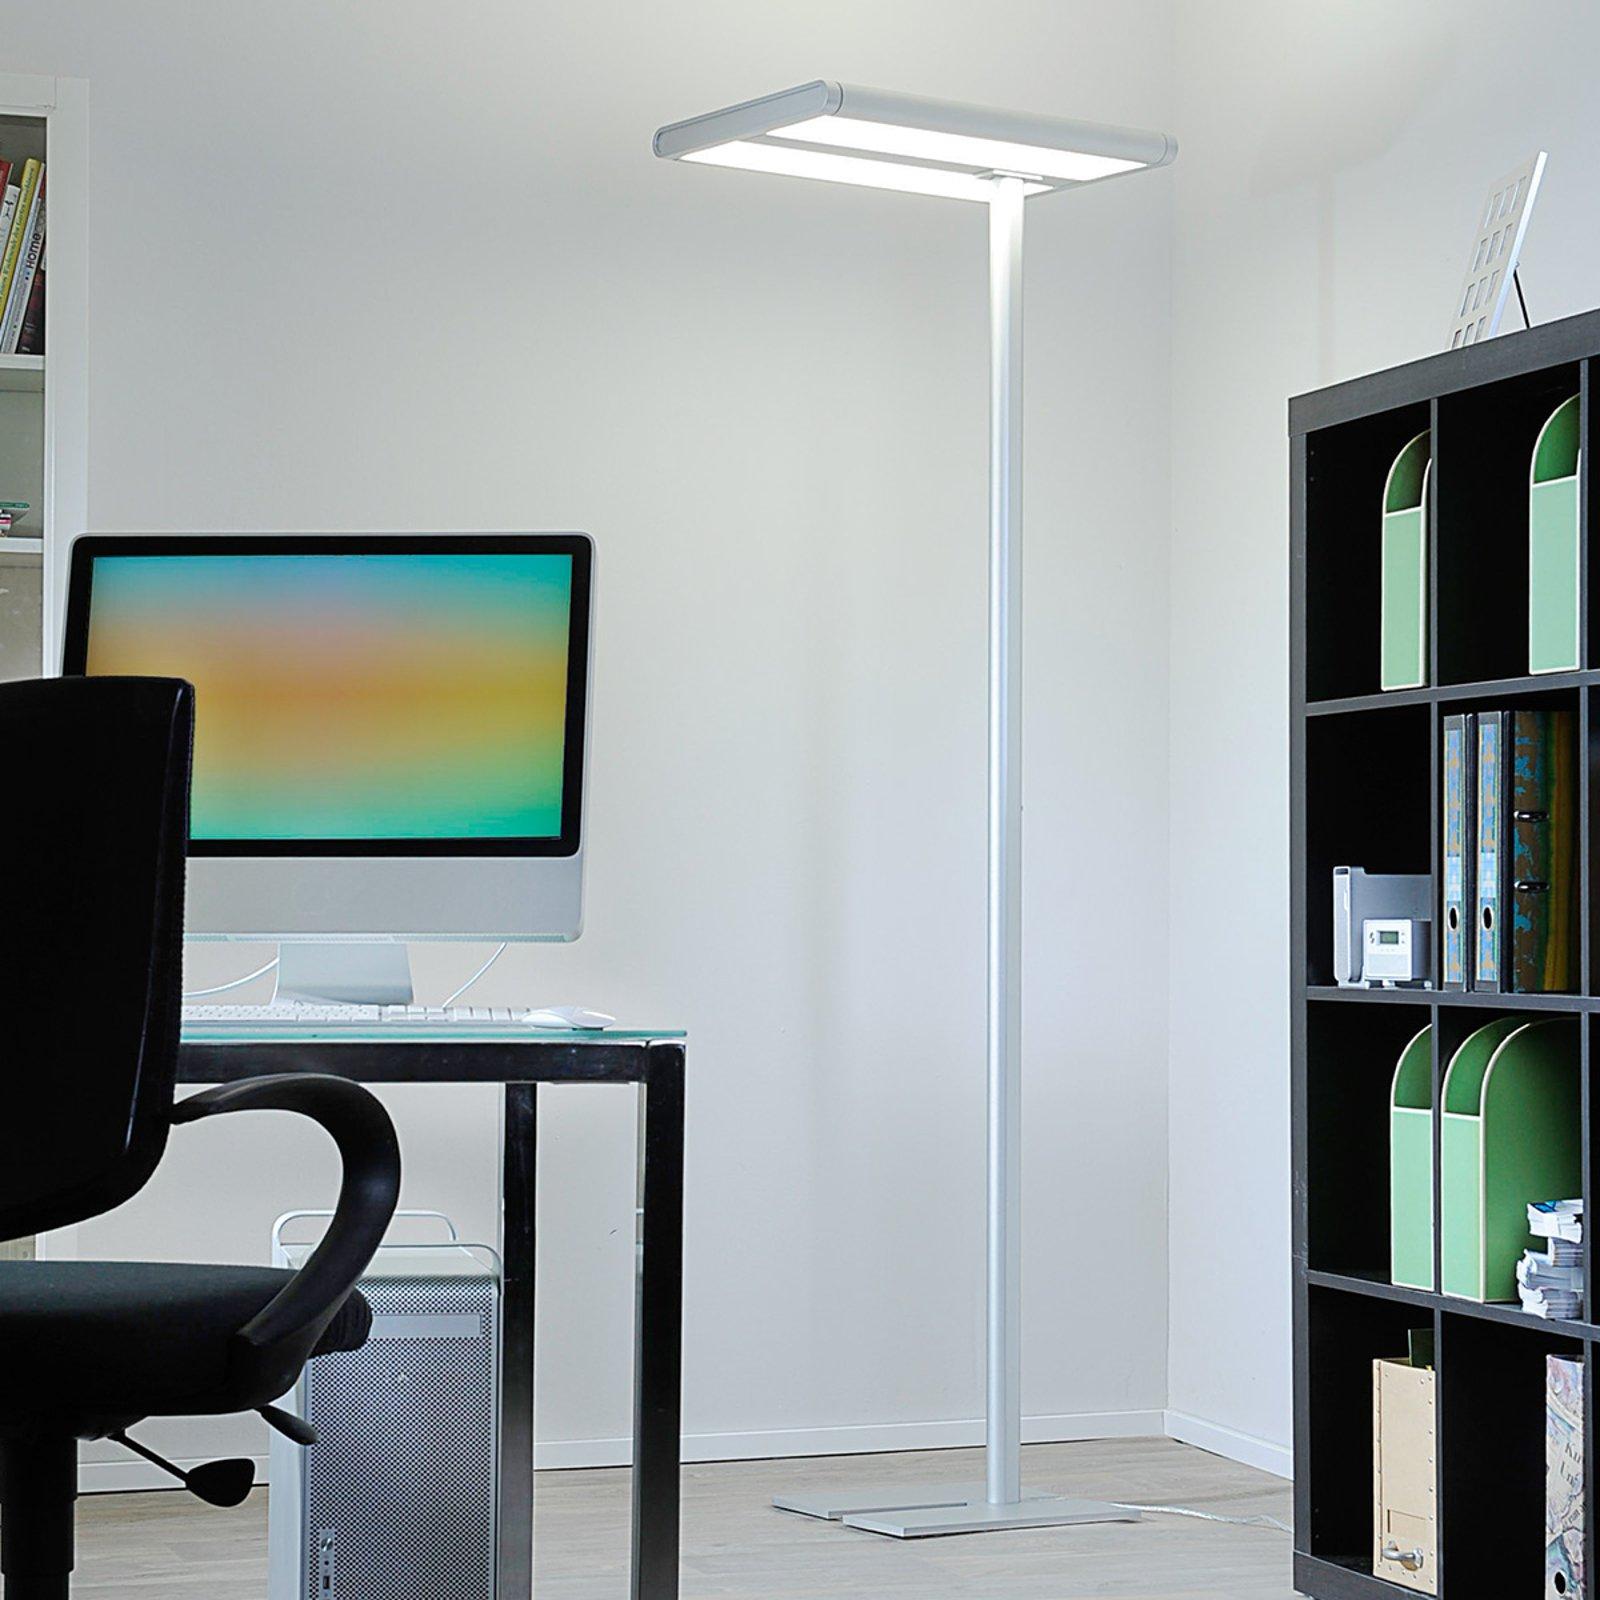 Quirin LED gulvlampe aluminium, 110 W, 4 000 K